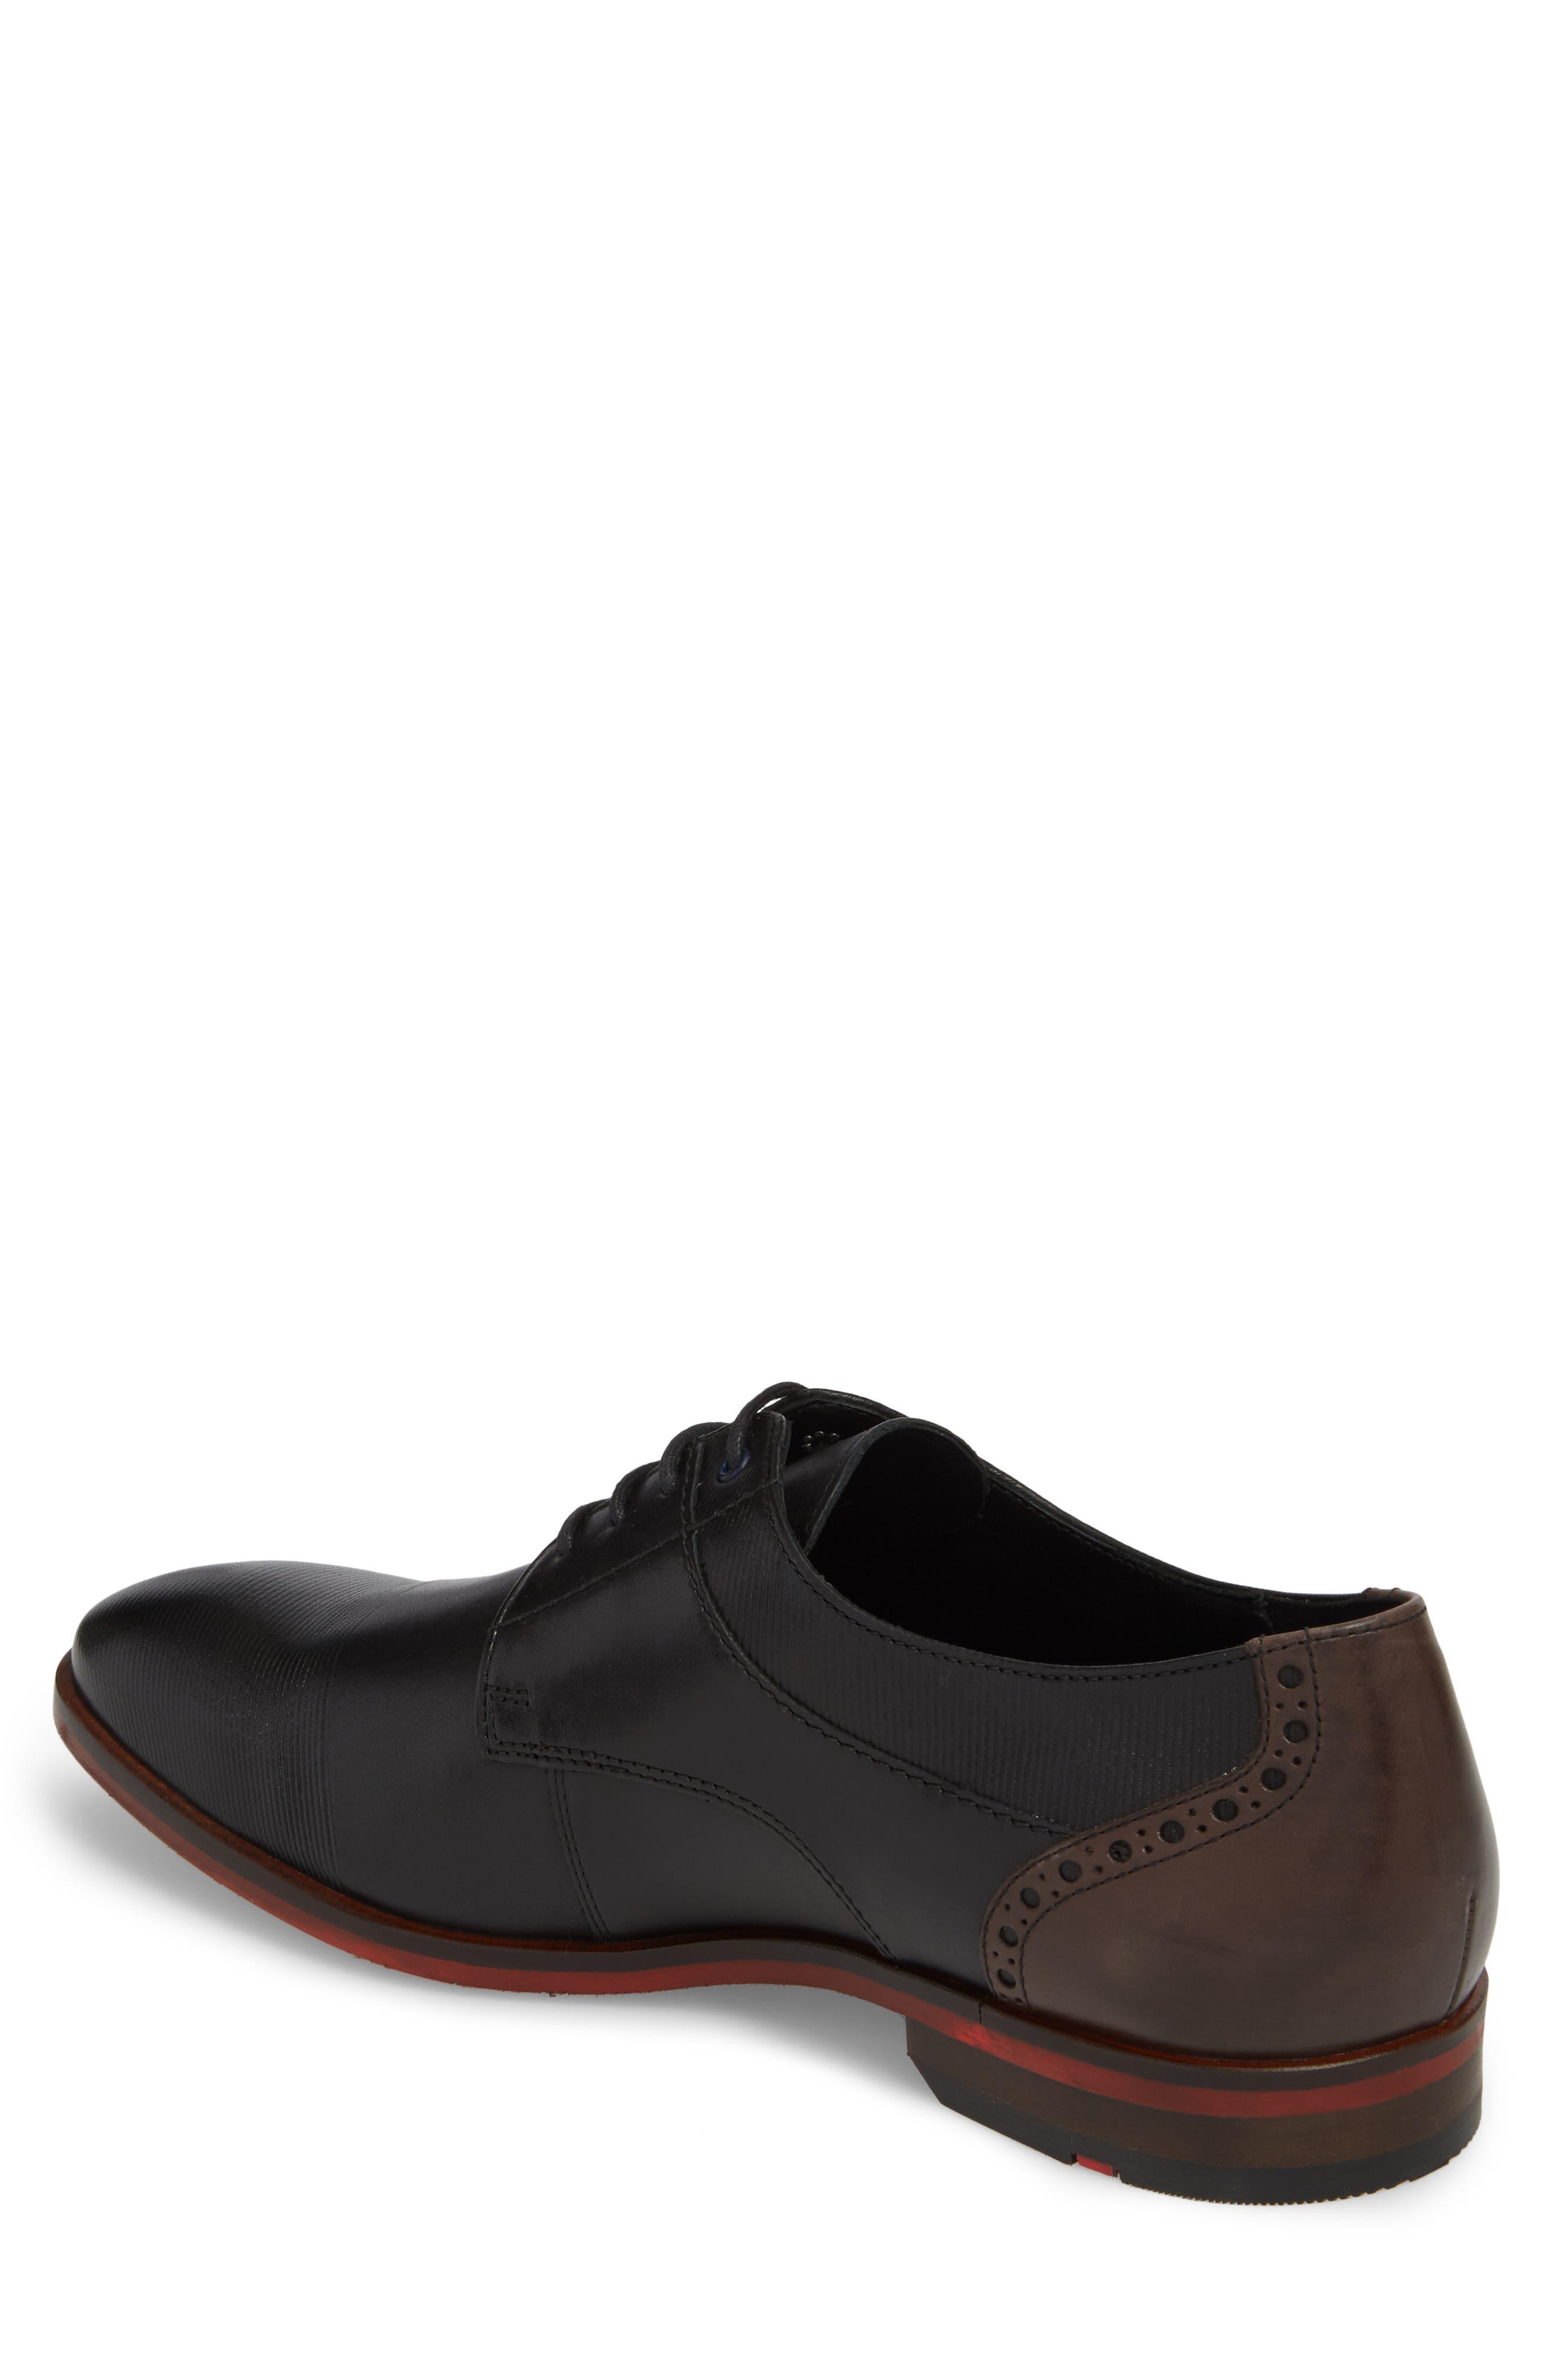 Henley Embossed Cap Toe Derby,                             Alternate thumbnail 2, color,                             Black/ Blue Leather